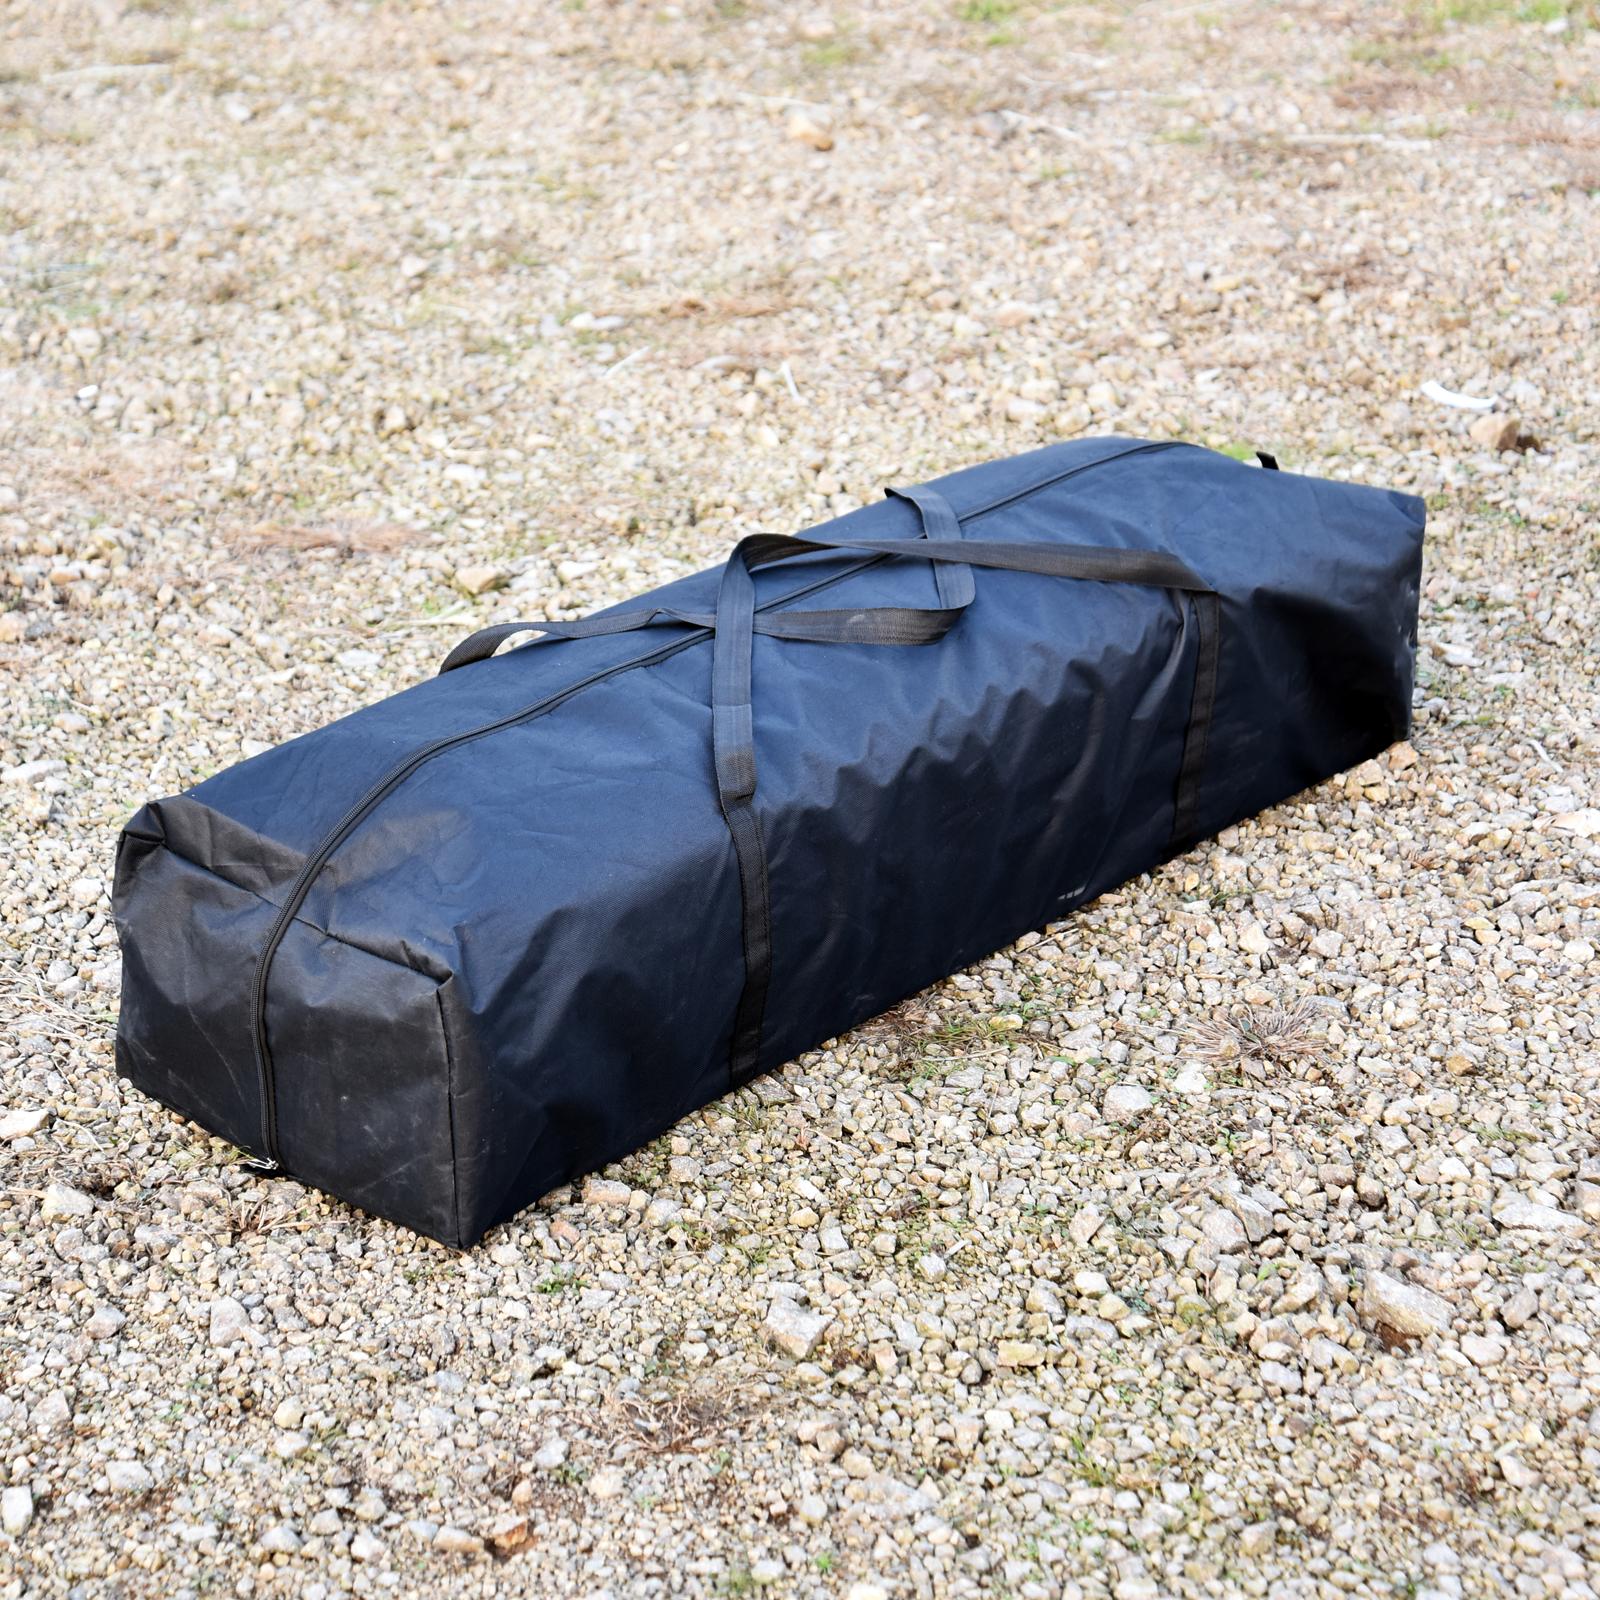 Outdoor-10-039-x20-039-EZ-POP-UP-Gazebo-Wedding-Party-Tent-Canopy-Folding-w-Carry-Bag thumbnail 37